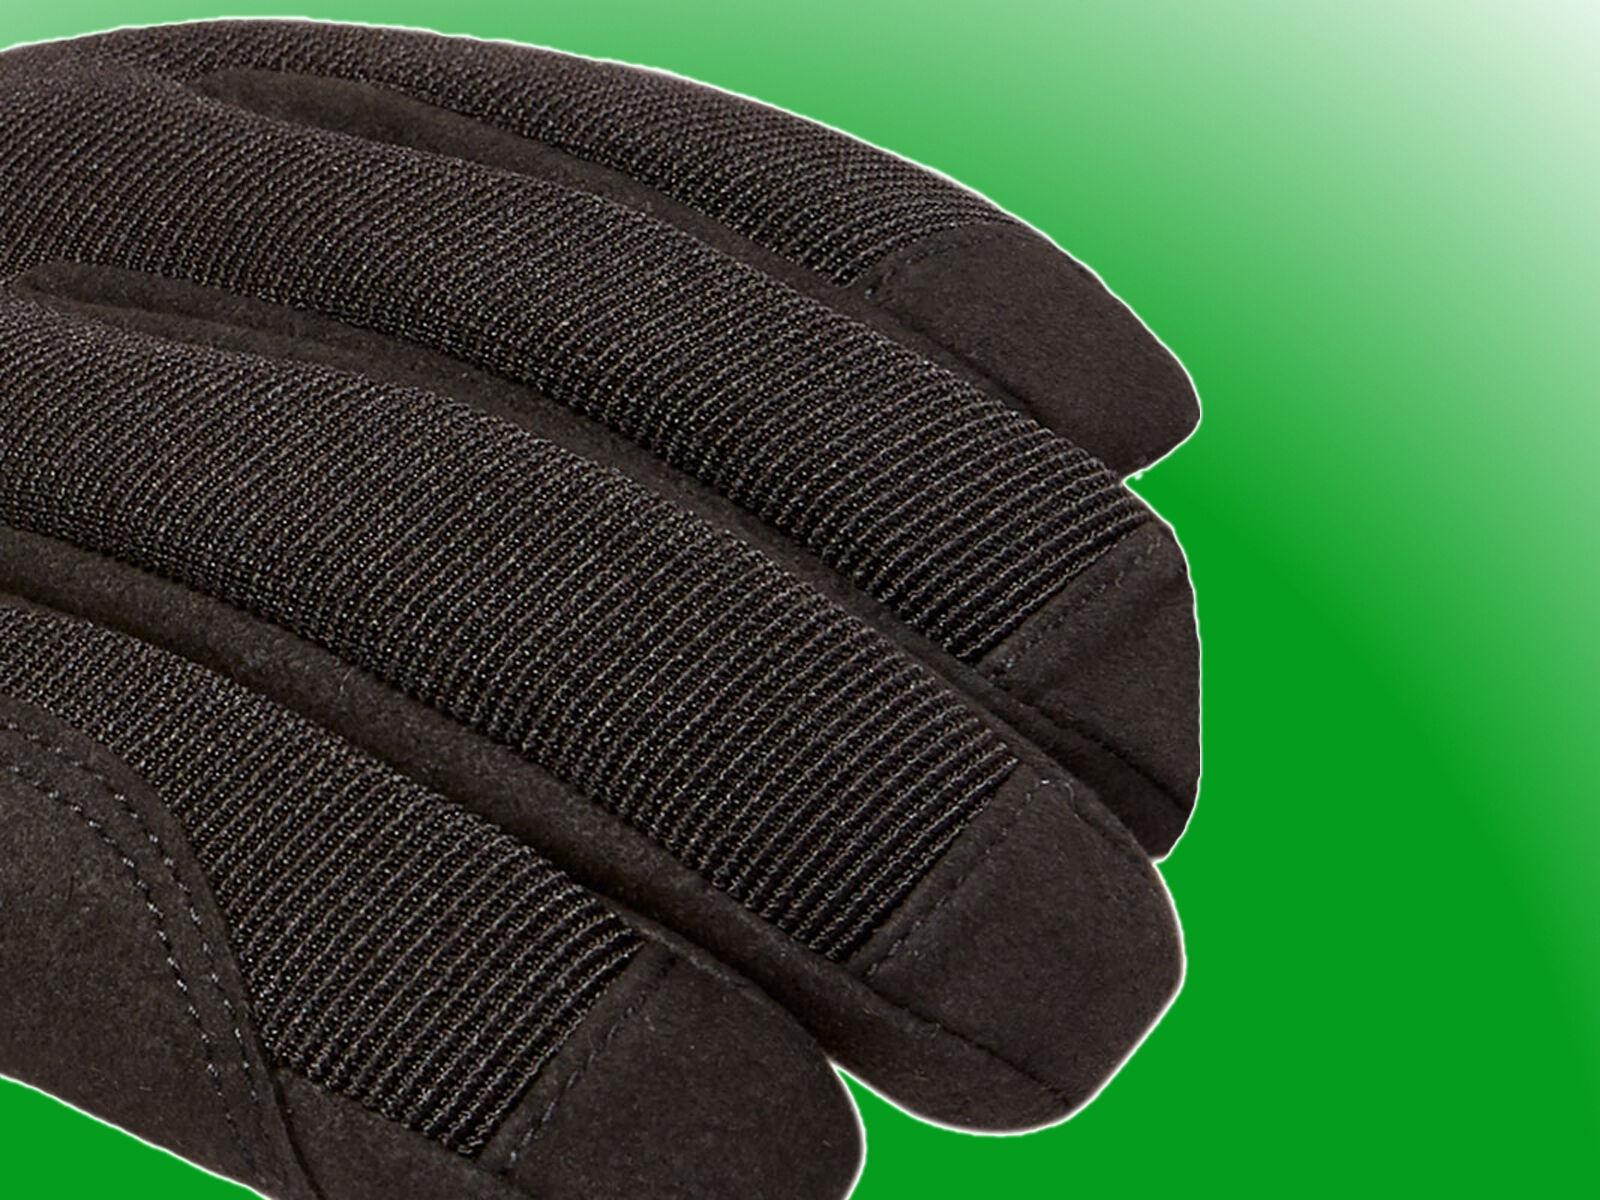 Dragon Eye Glove schwarz - Seal Skinz wasserdichte wasserdichte wasserdichte   wasserfeste Handschuhe 571841